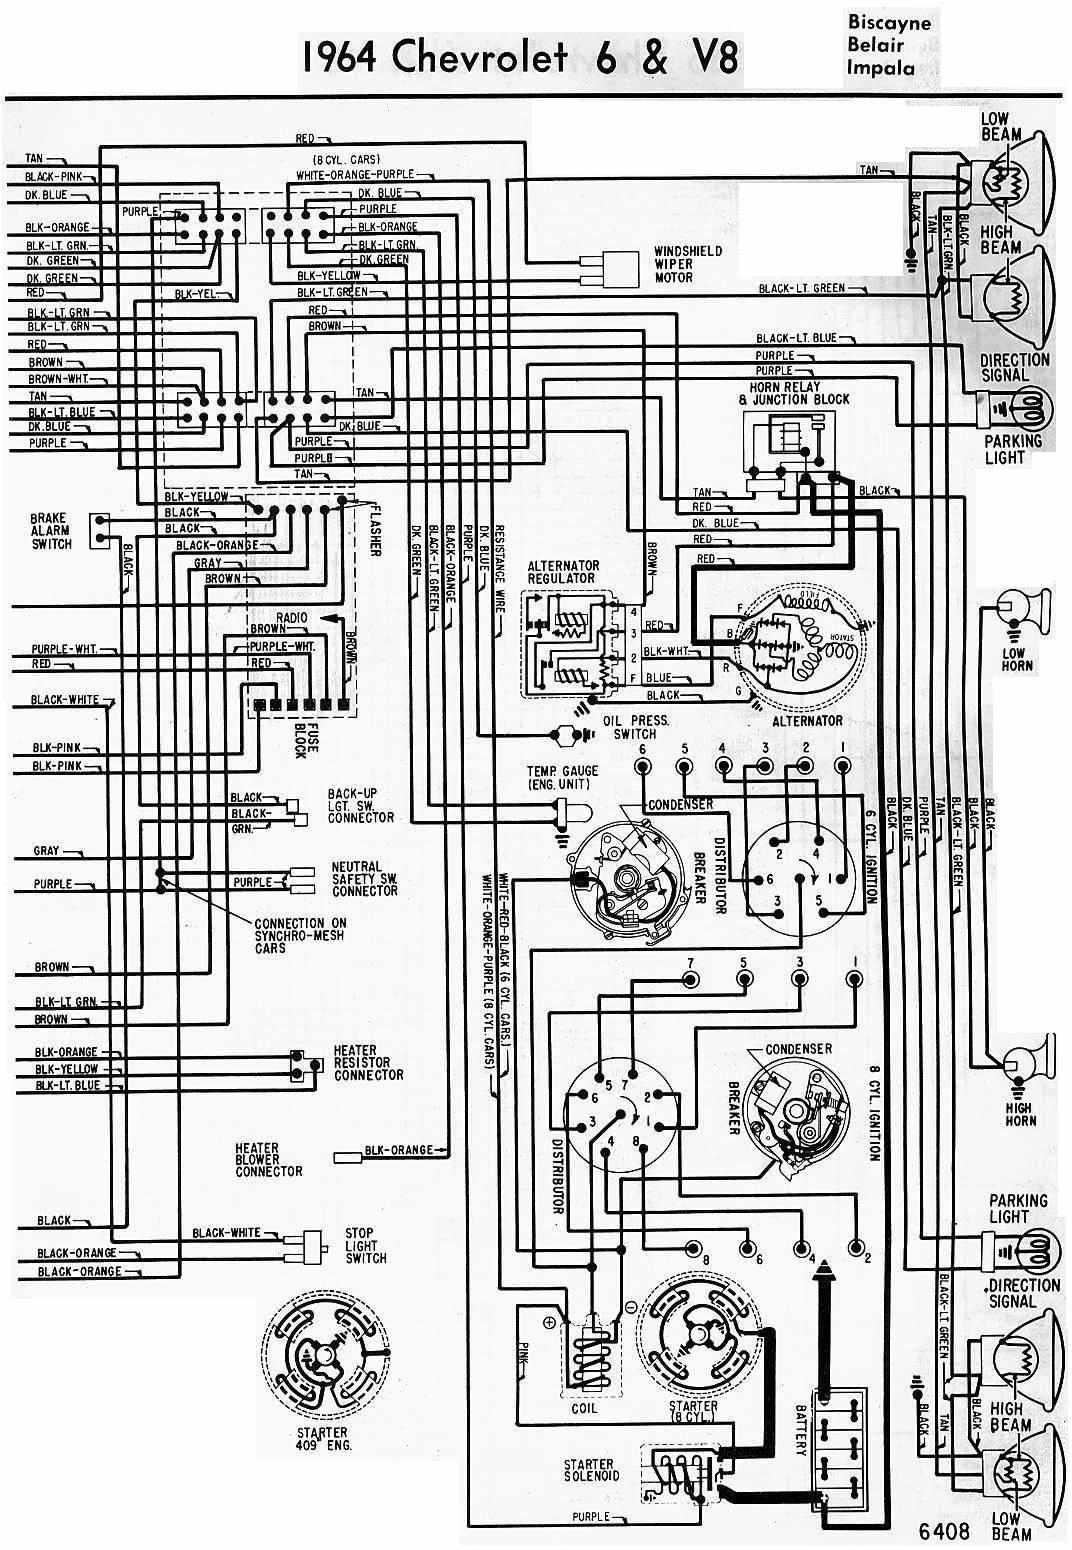 EY_9505] 1965 Chevy Wiring Diagram On 1963 Impala Turn Signal Wiring Diagram  Schematic WiringArnes Osoph Umng Mohammedshrine Librar Wiring 101